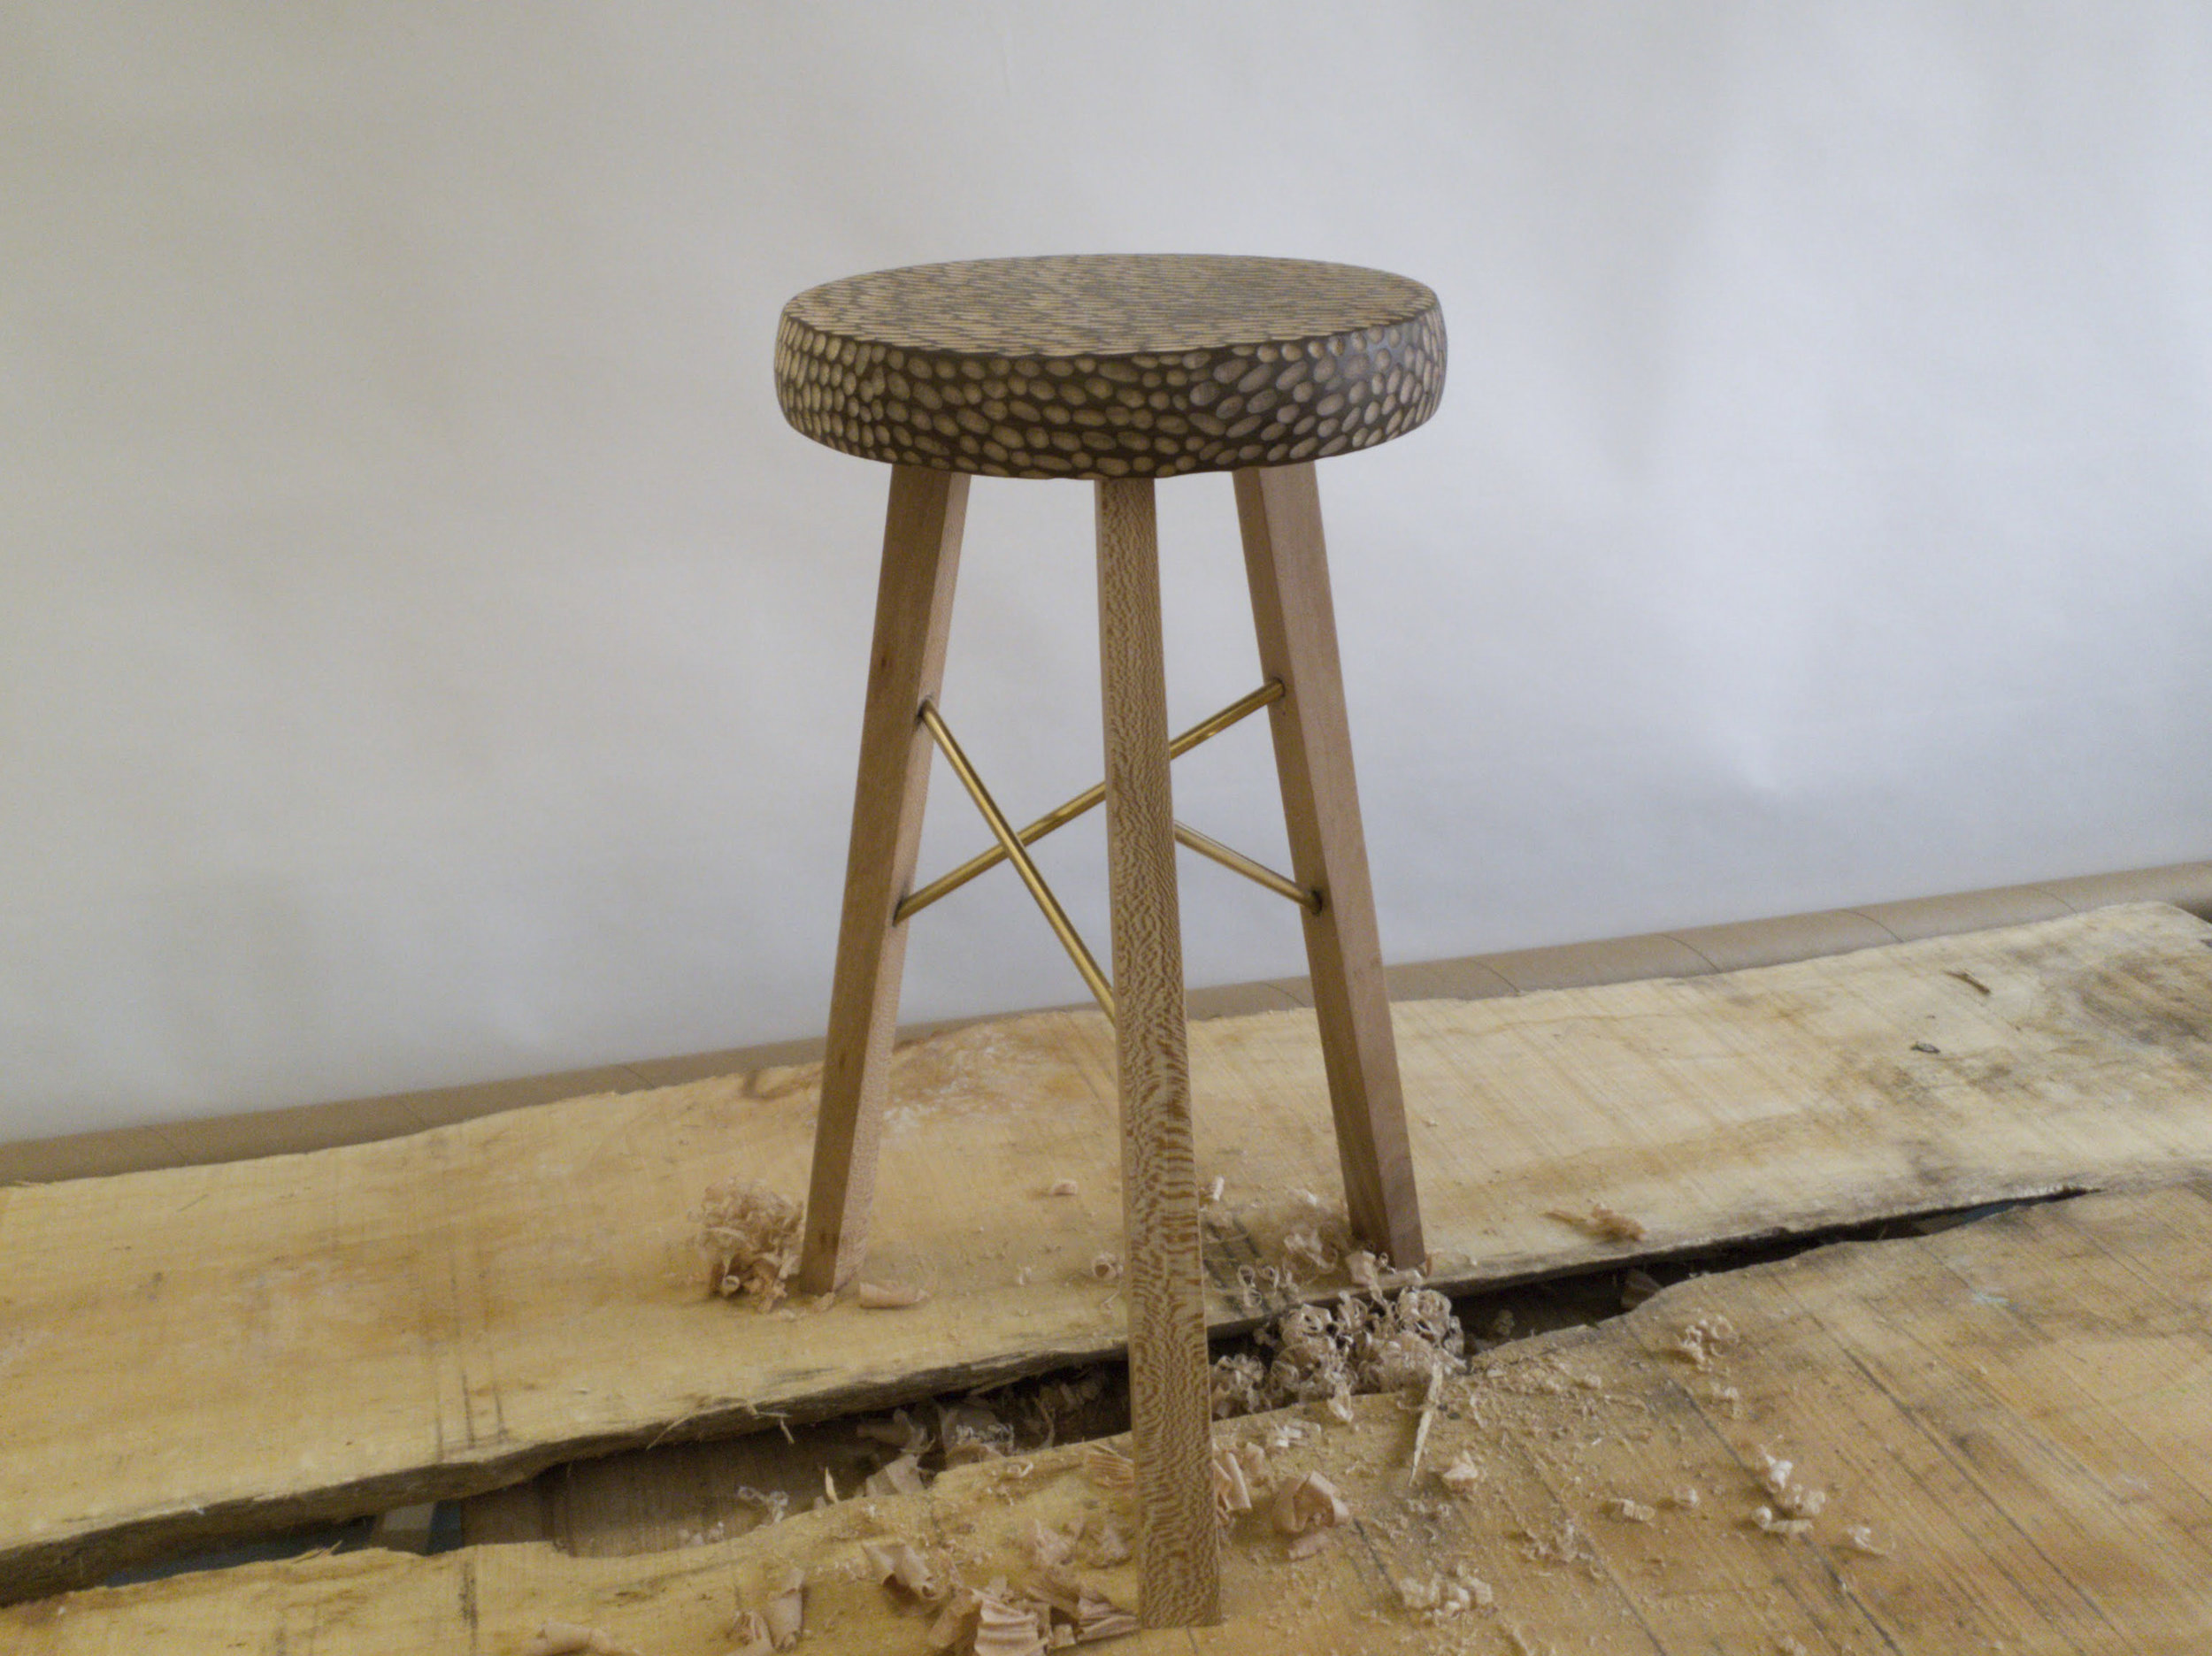 Heliconia_Furniture_Tripod_Stool (5).jpg